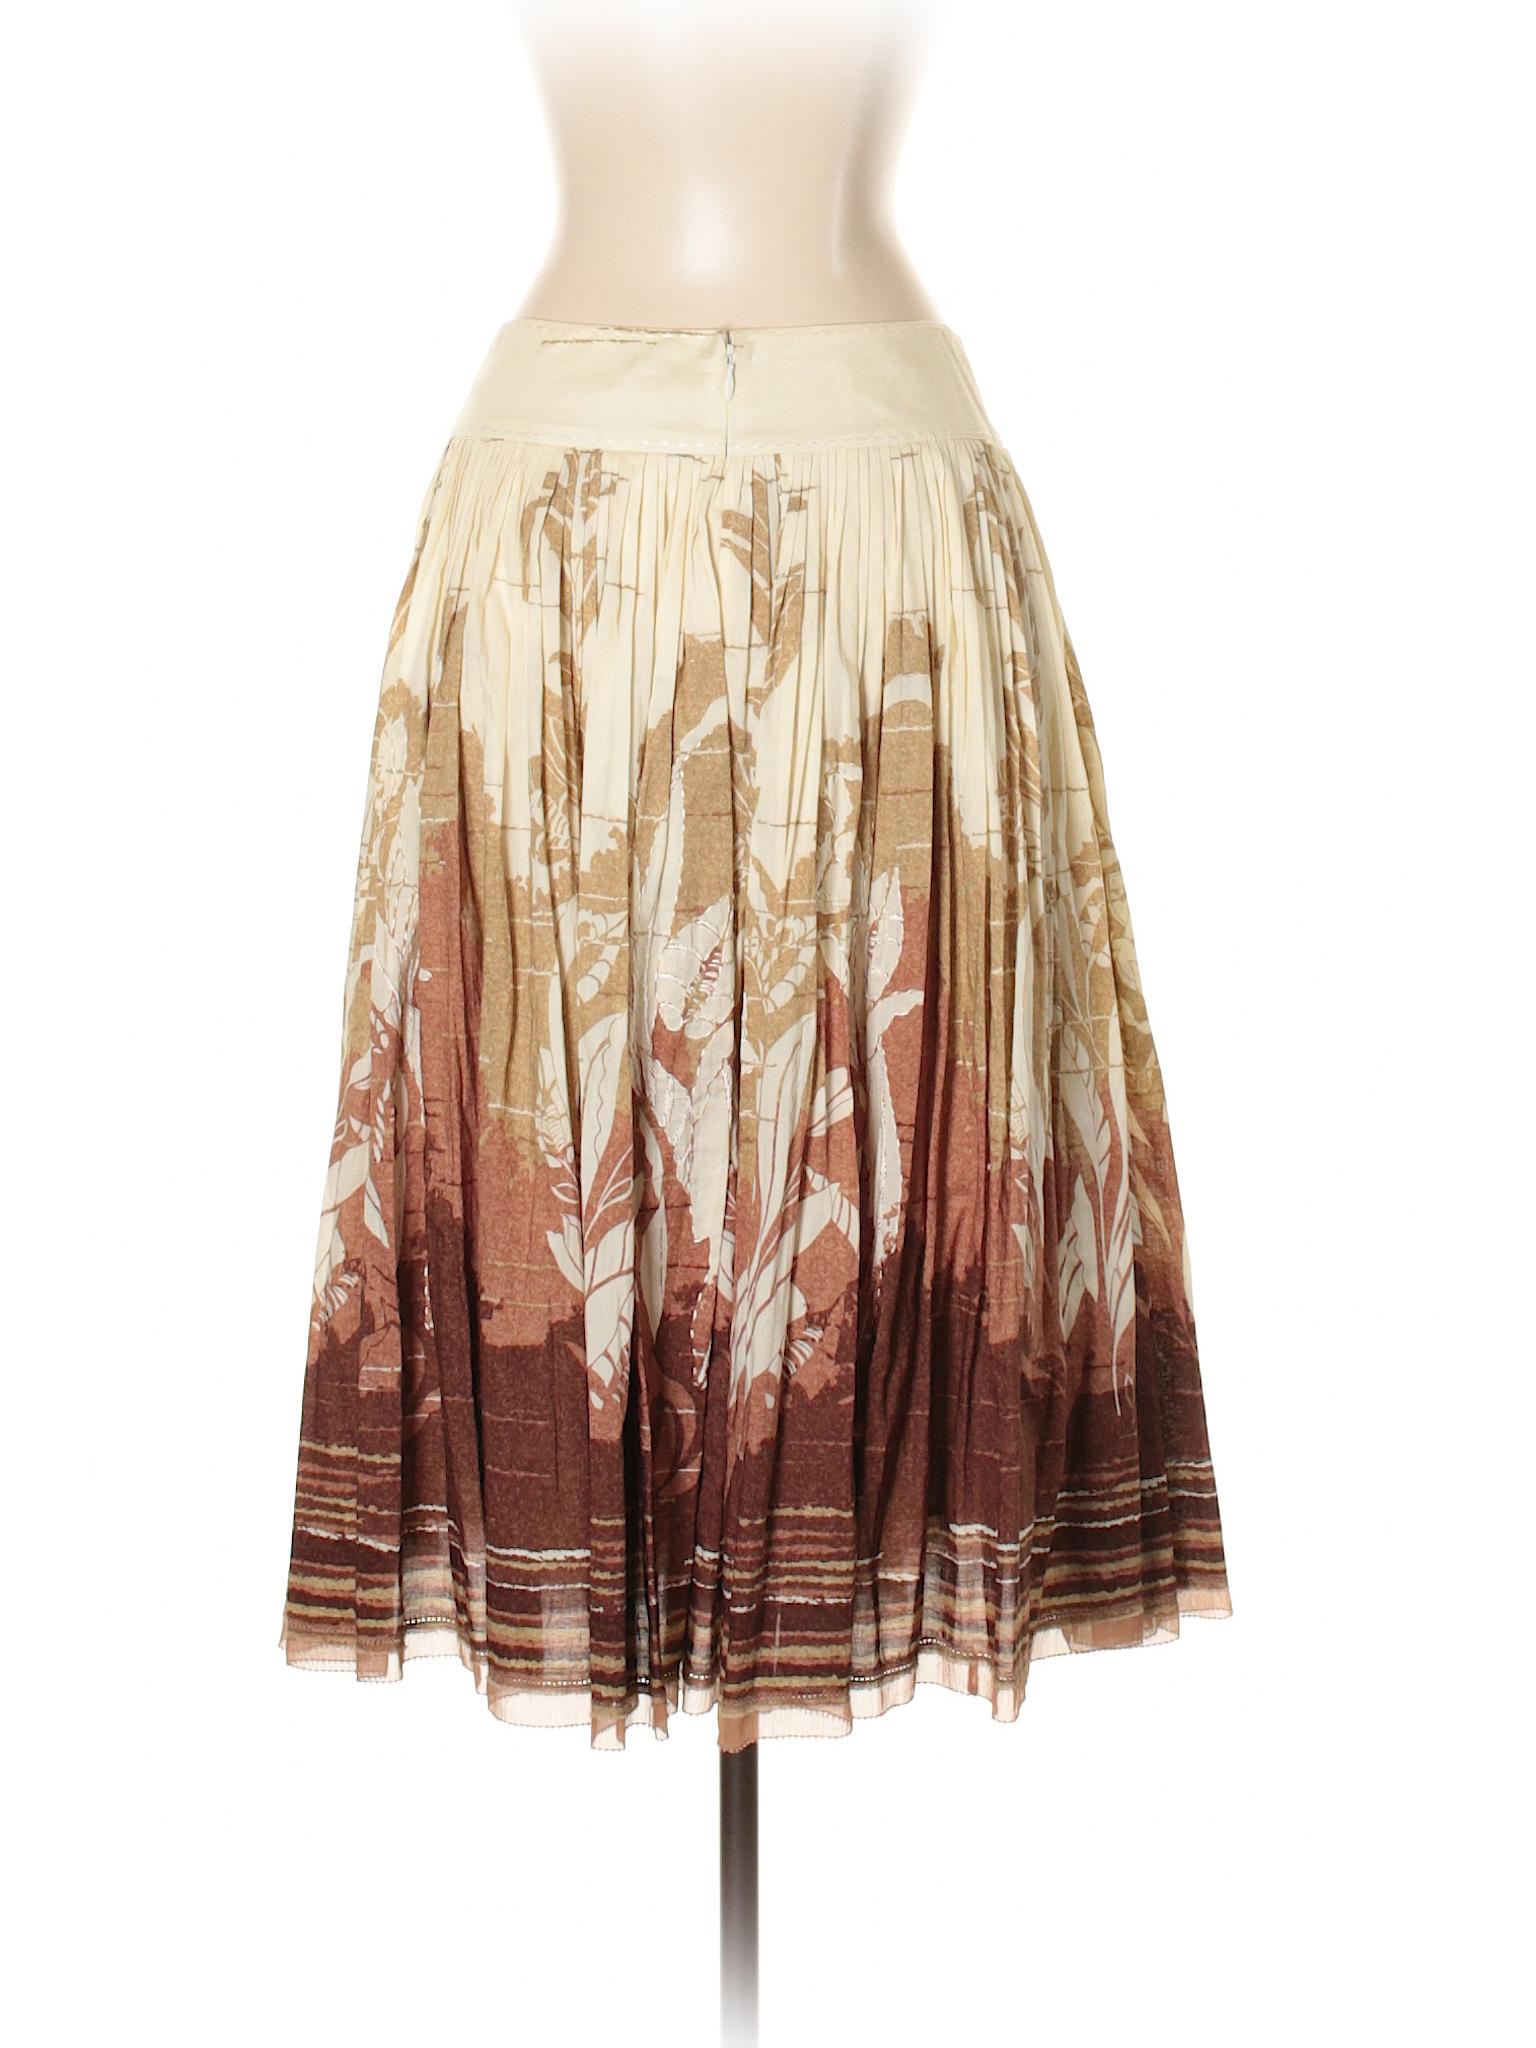 Boutique Elie Elie Boutique Casual Casual Tahari Skirt Tahari rqZxB6rCw